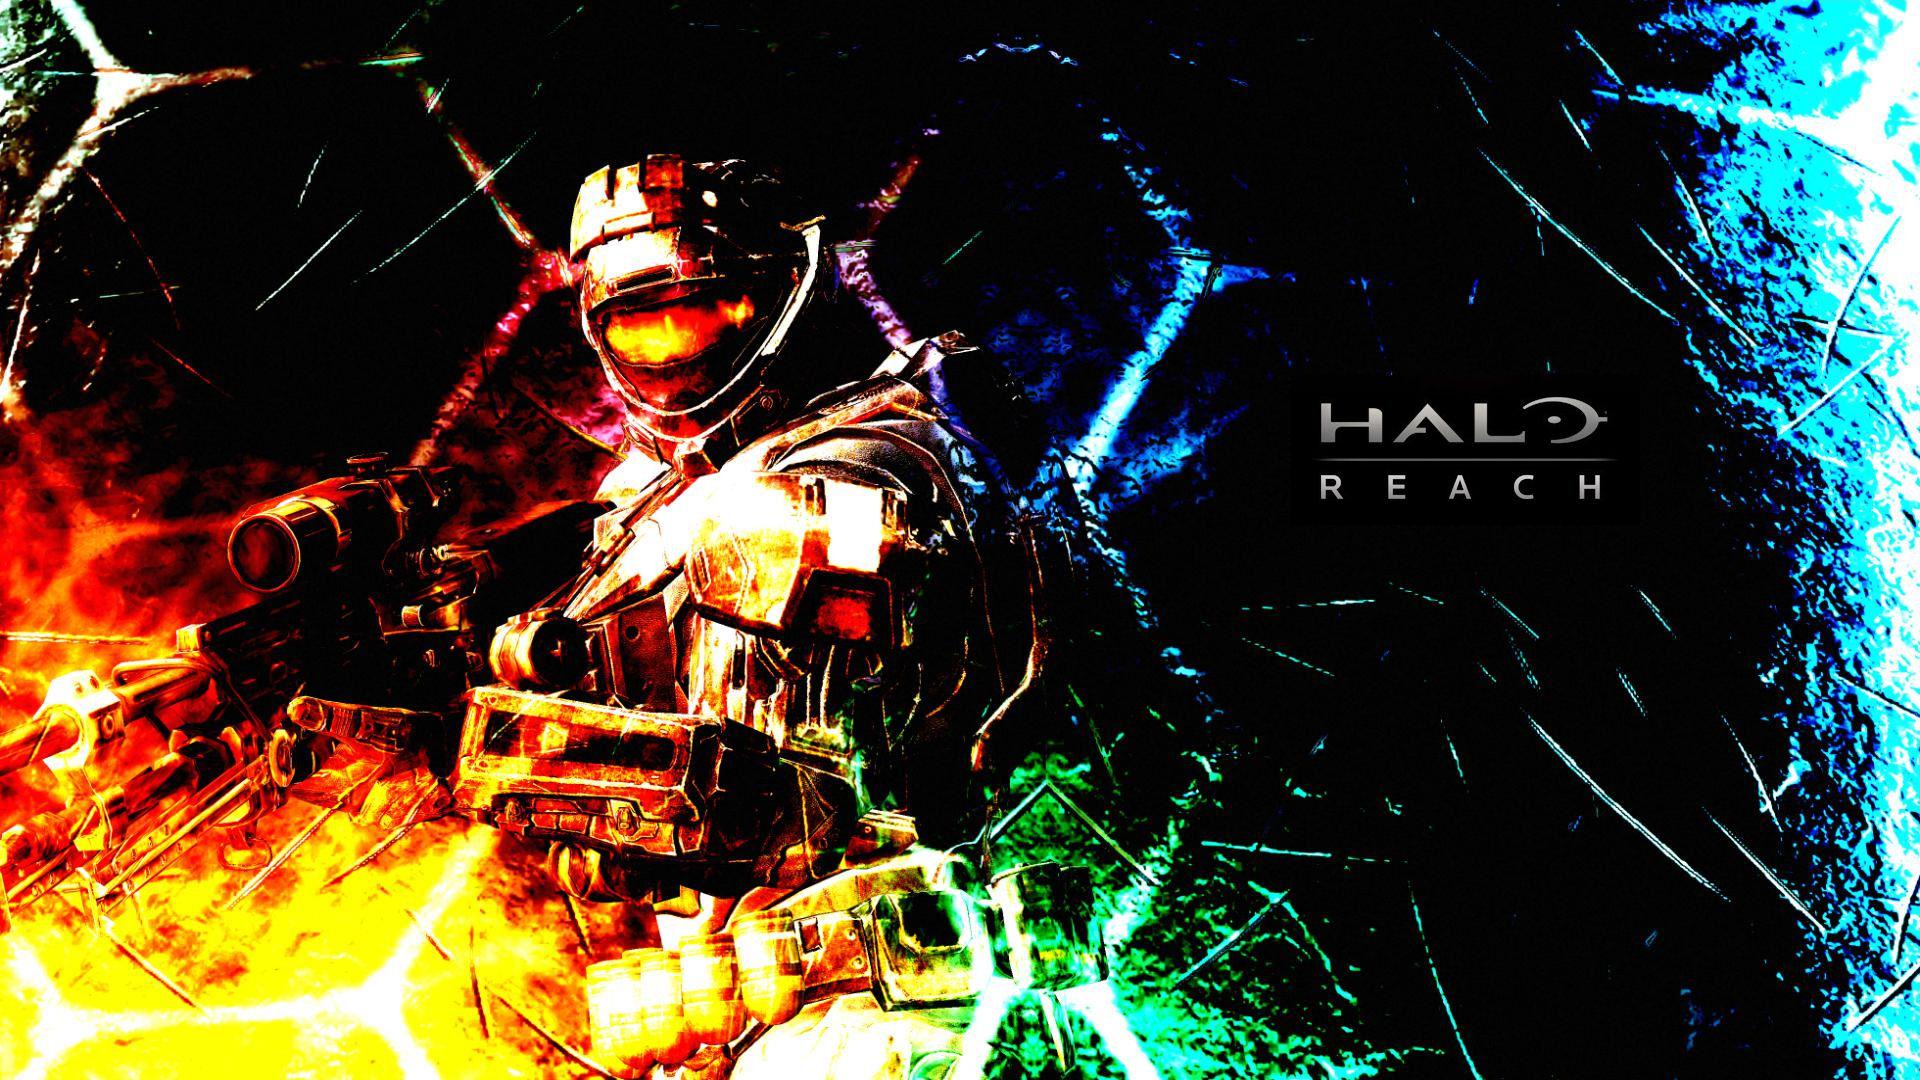 Halo Reach HD Wallpaper